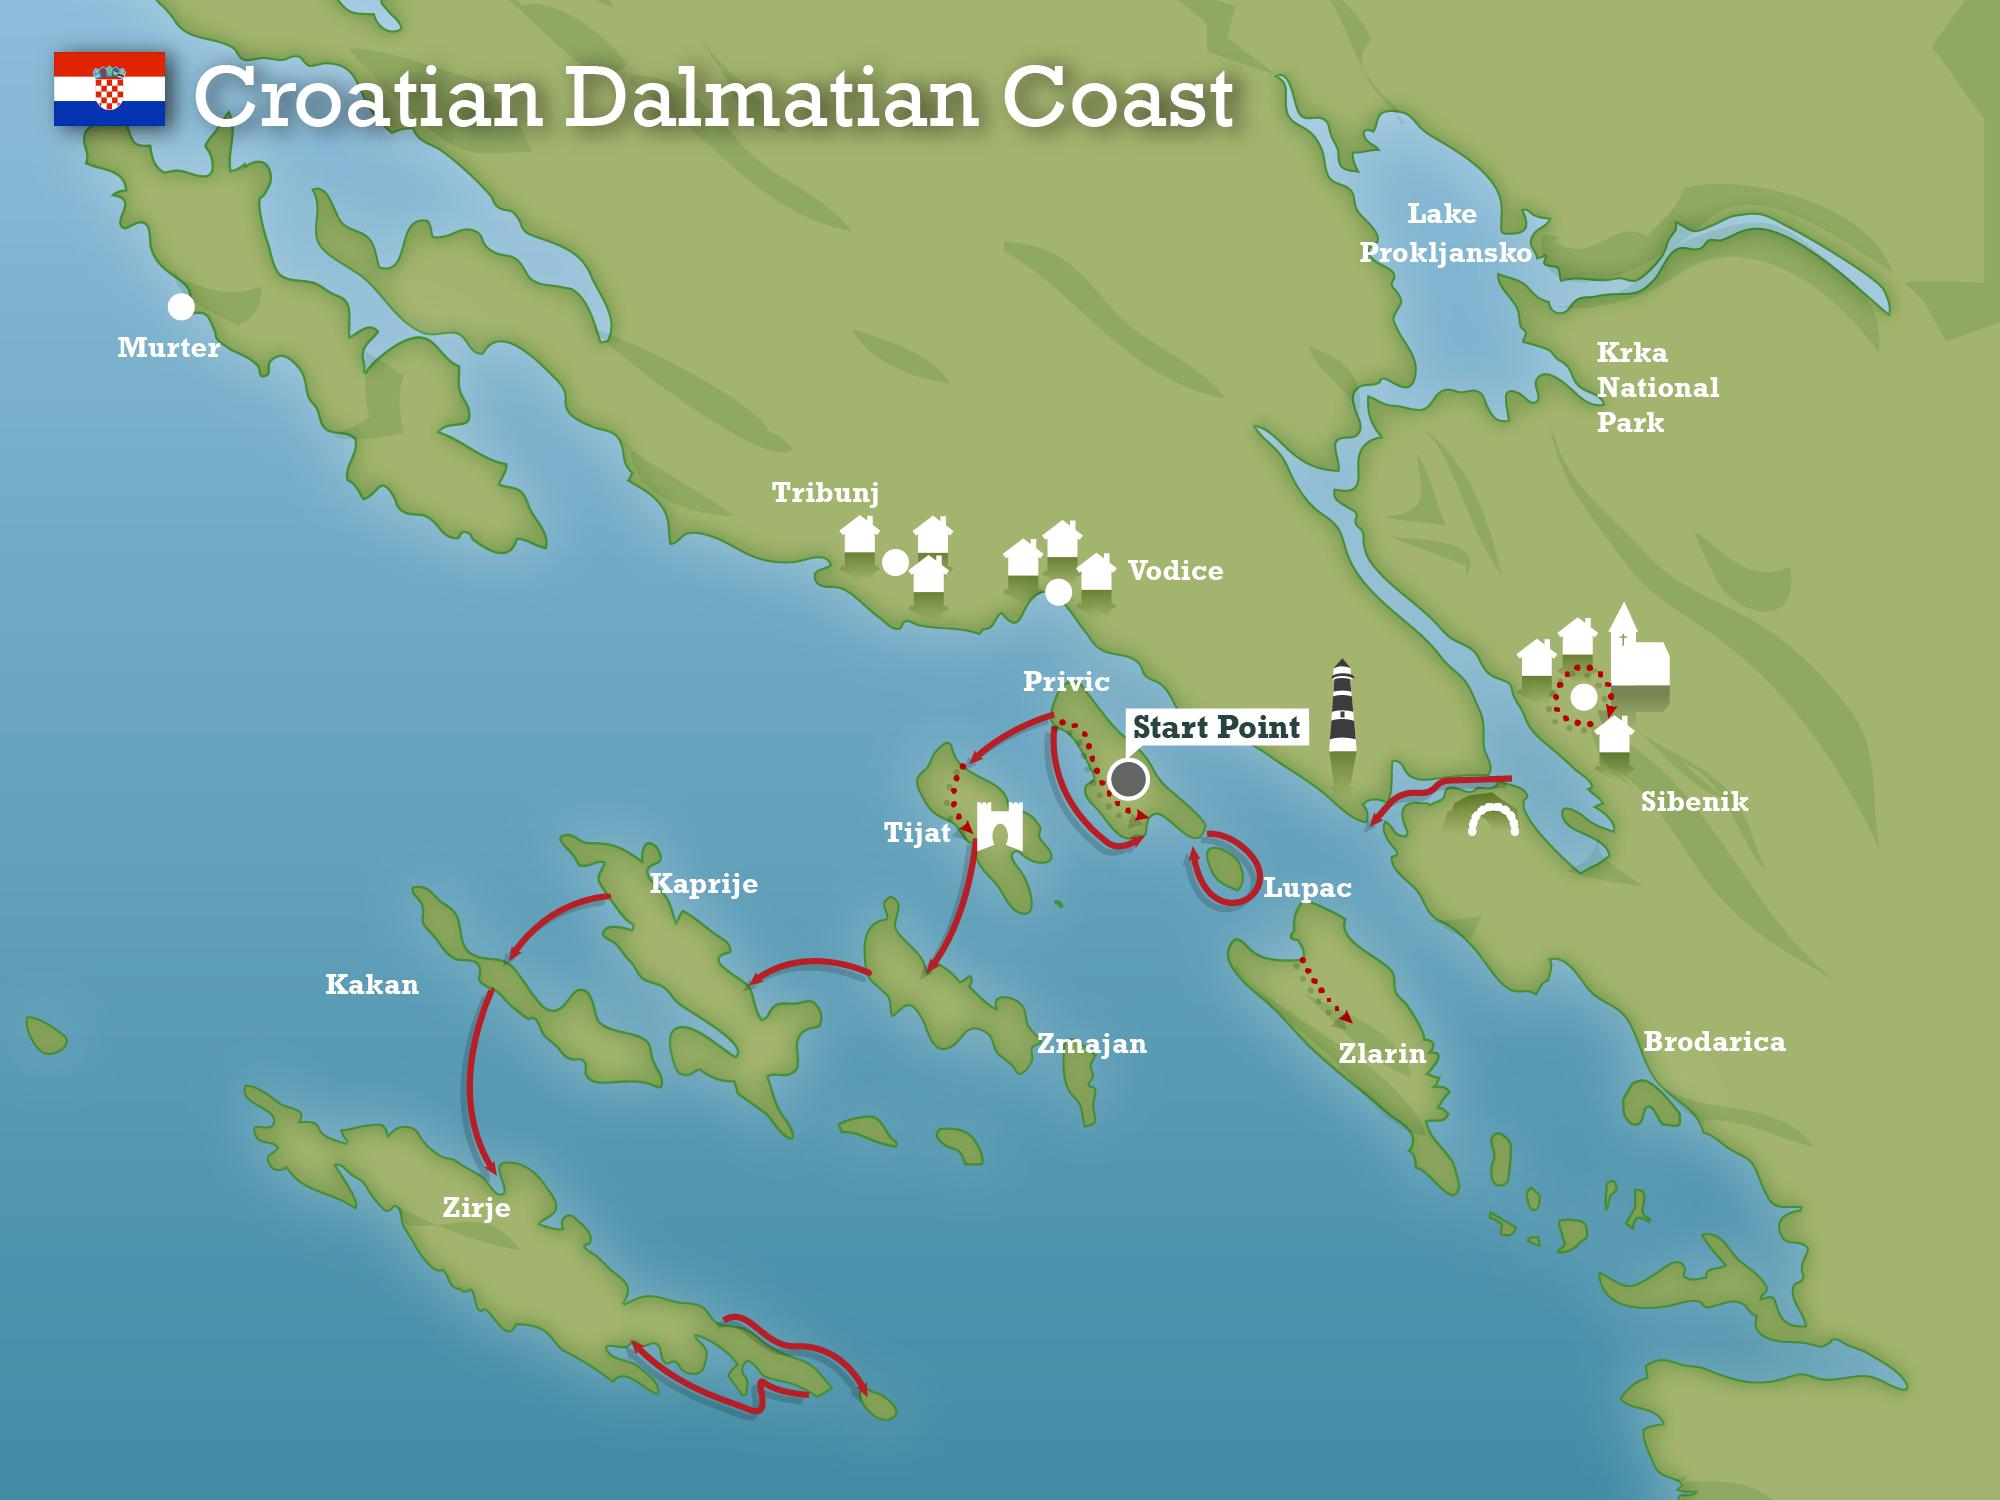 Dalmatian coast croatia